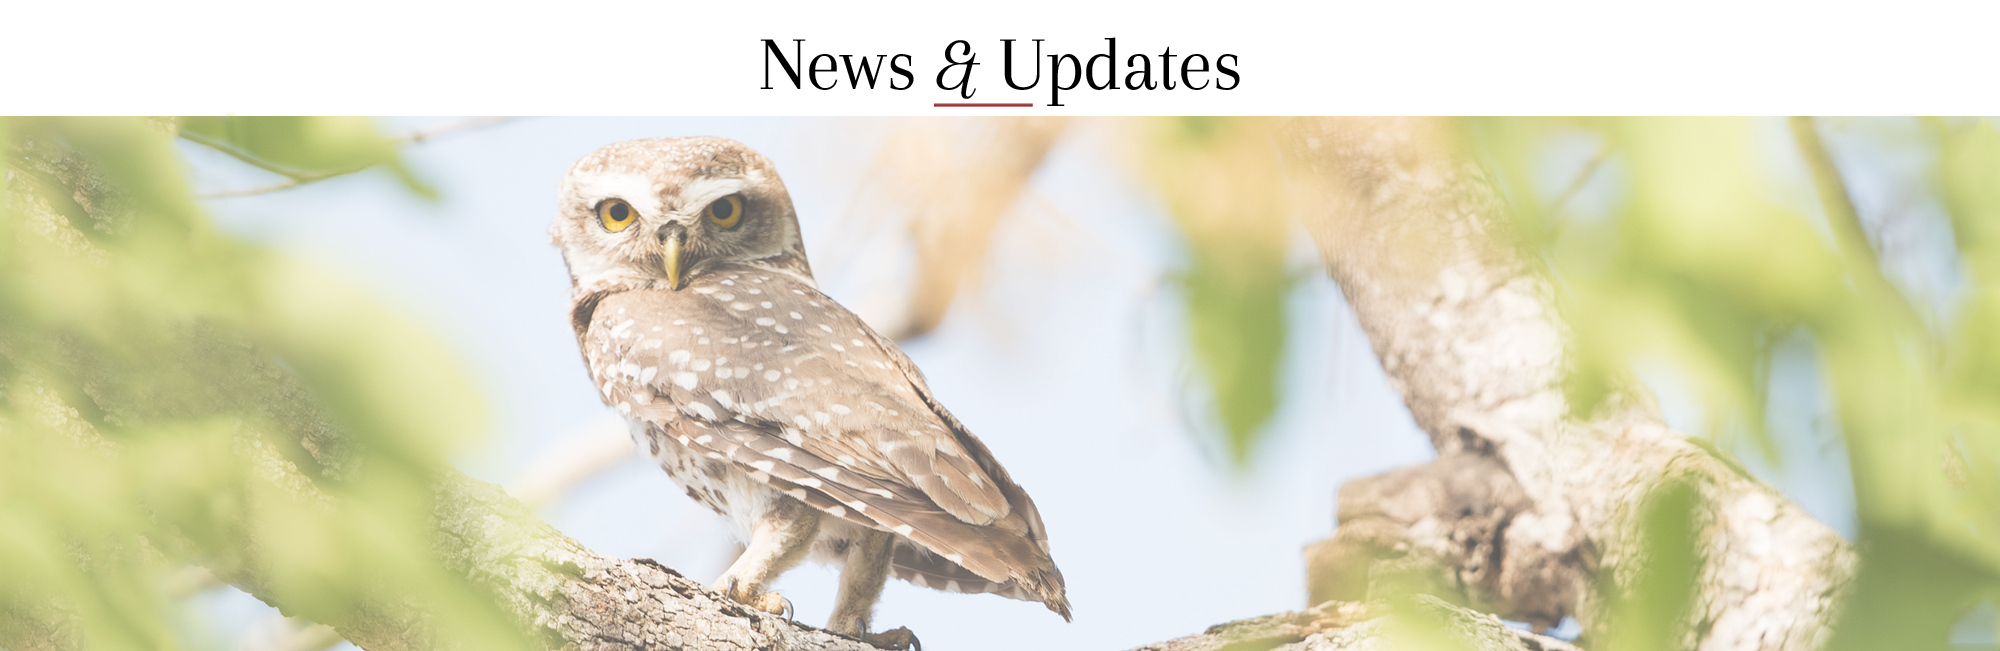 OVMA News and Updates